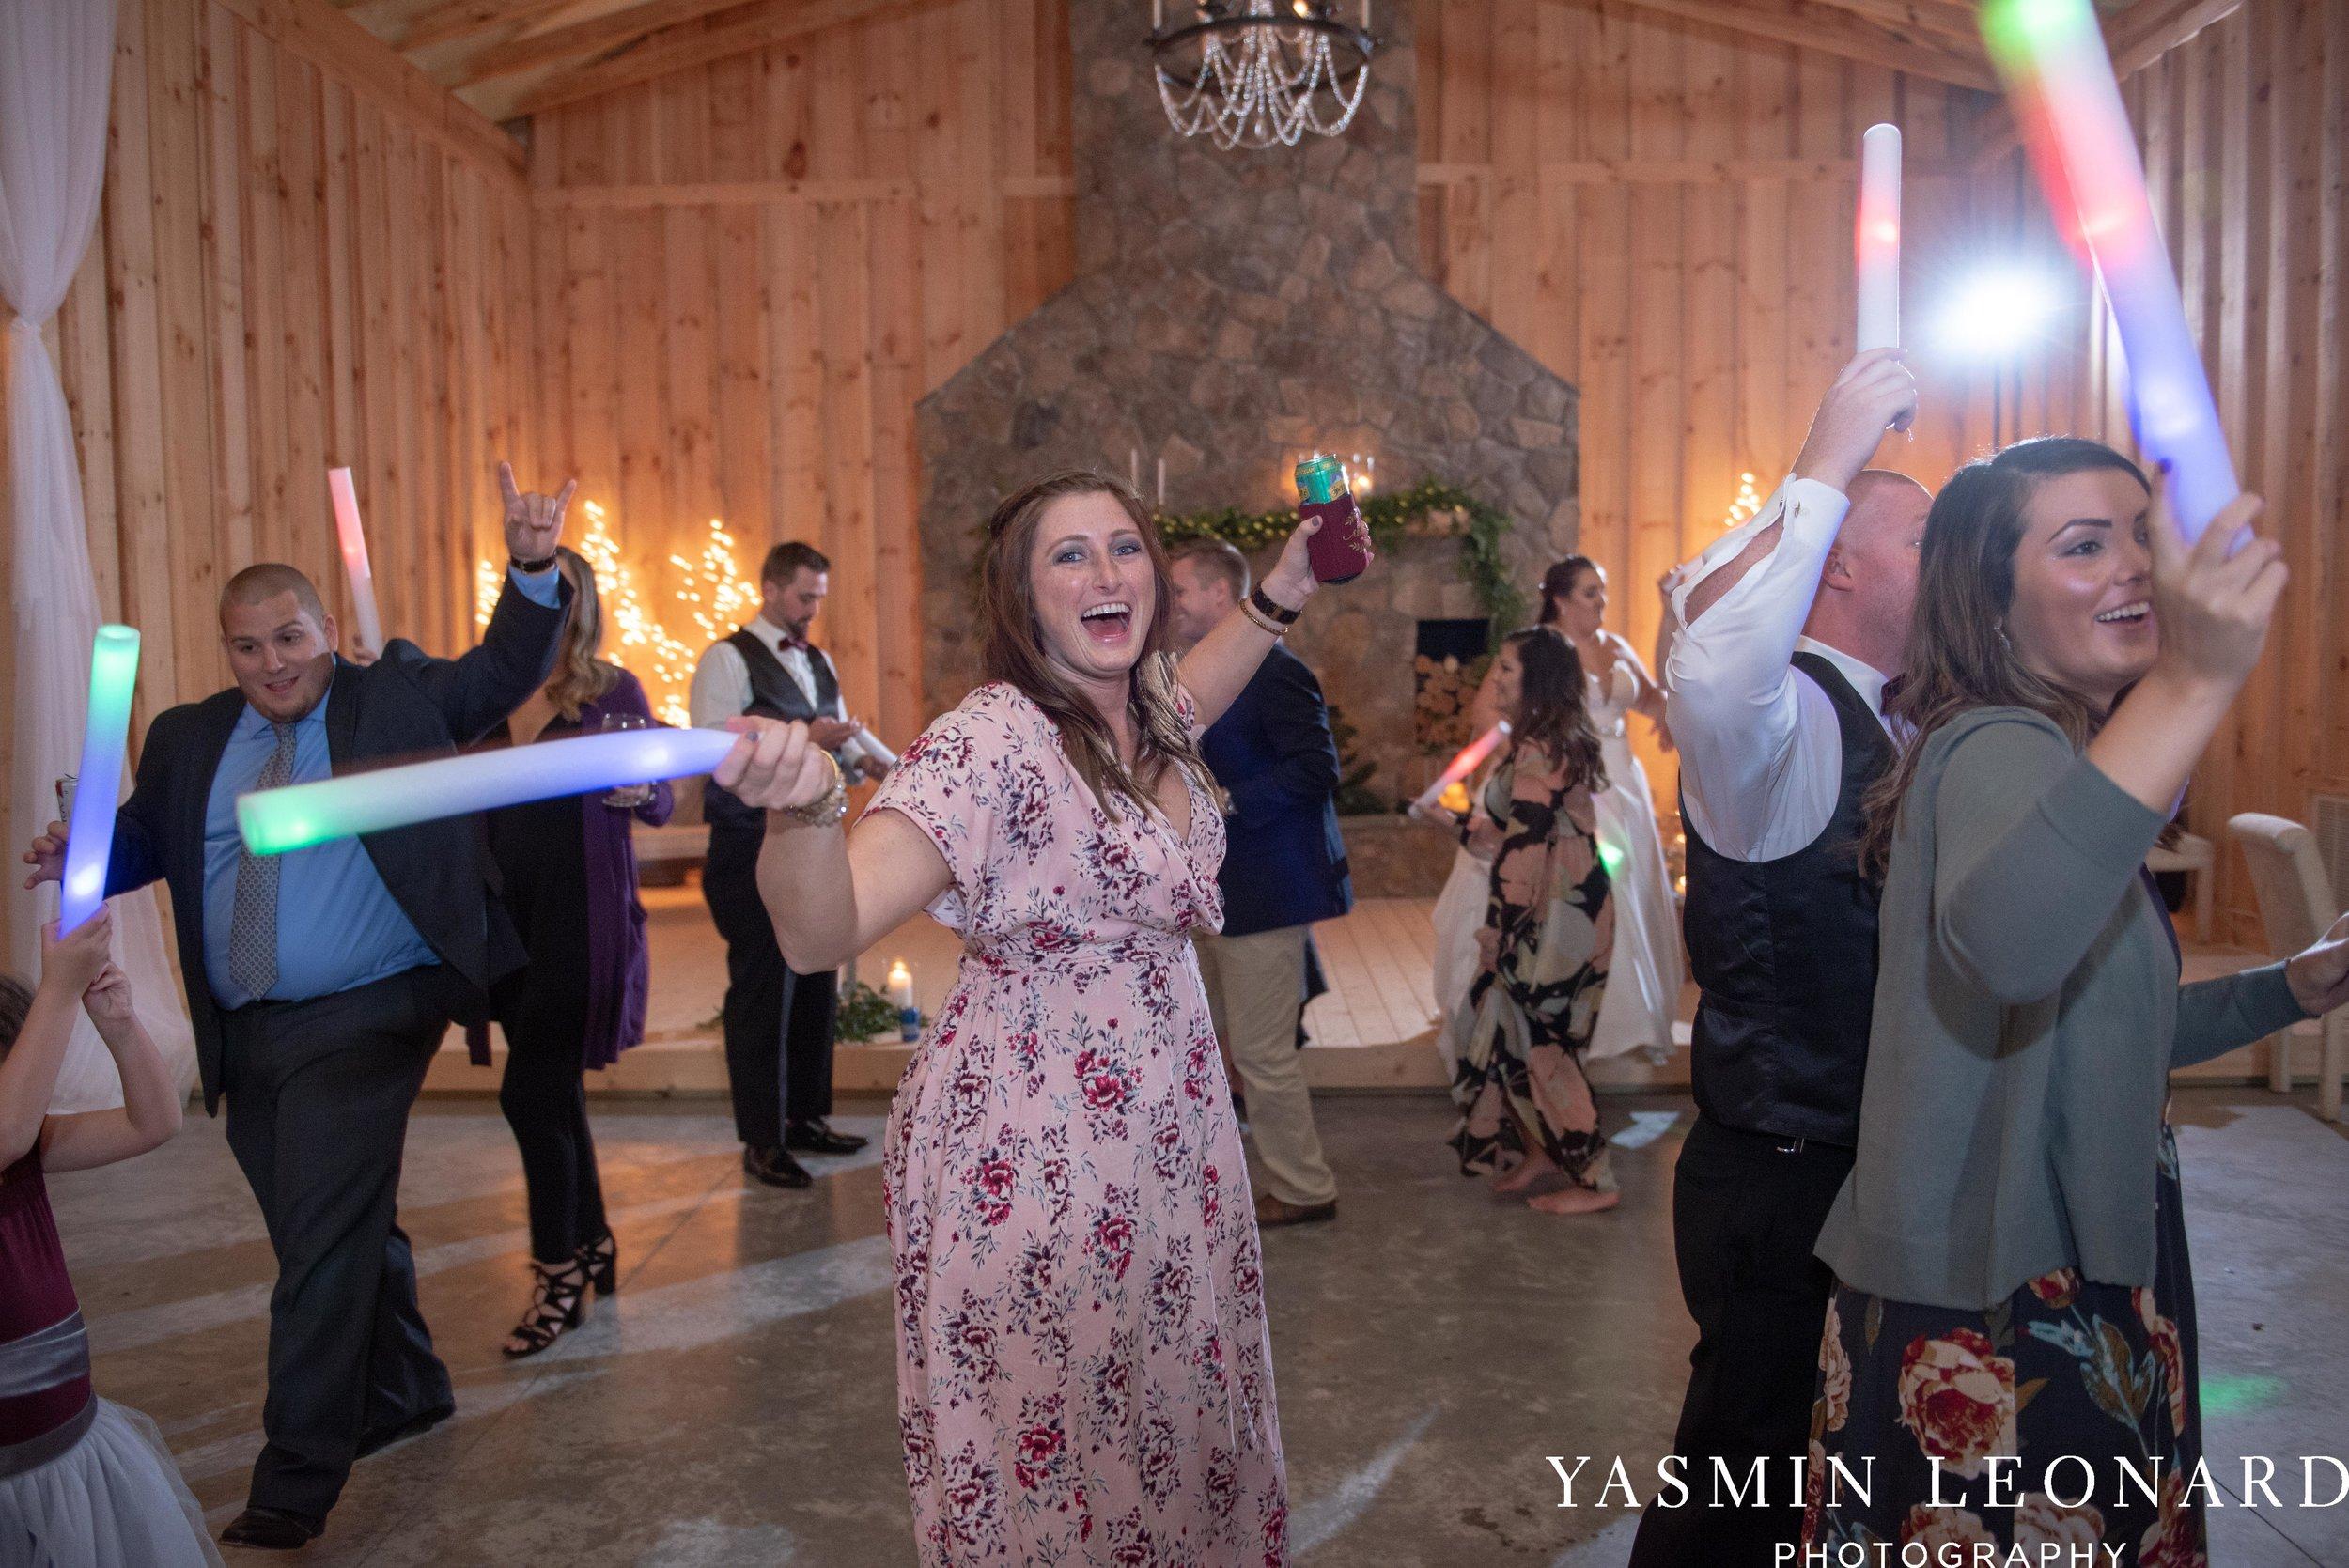 Wesley Memorial United Methodist Church - Old Homeplace Winery - High Point Weddings - High Point Wedding Photographer - NC Weddings - NC Barn Venue - Yasmin Leonard Photography-73.jpg